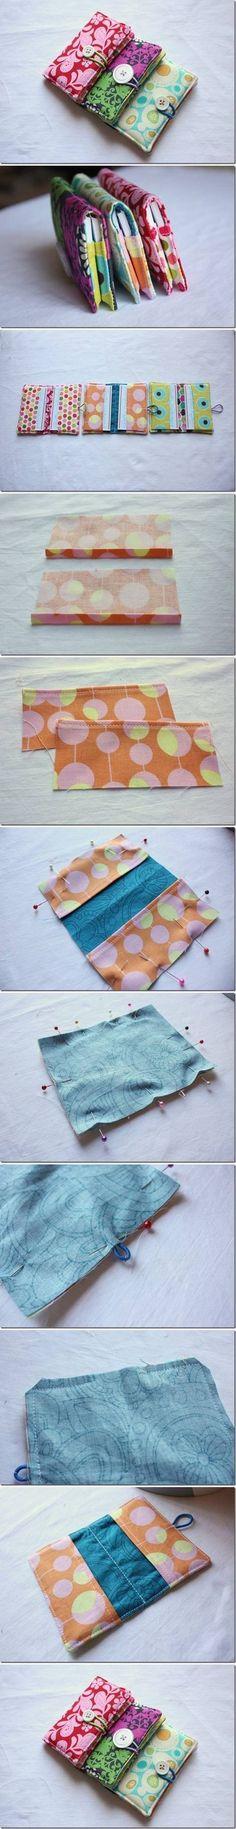 DIY Sew Business Card Holder DIY Projects / UsefulDIY.com